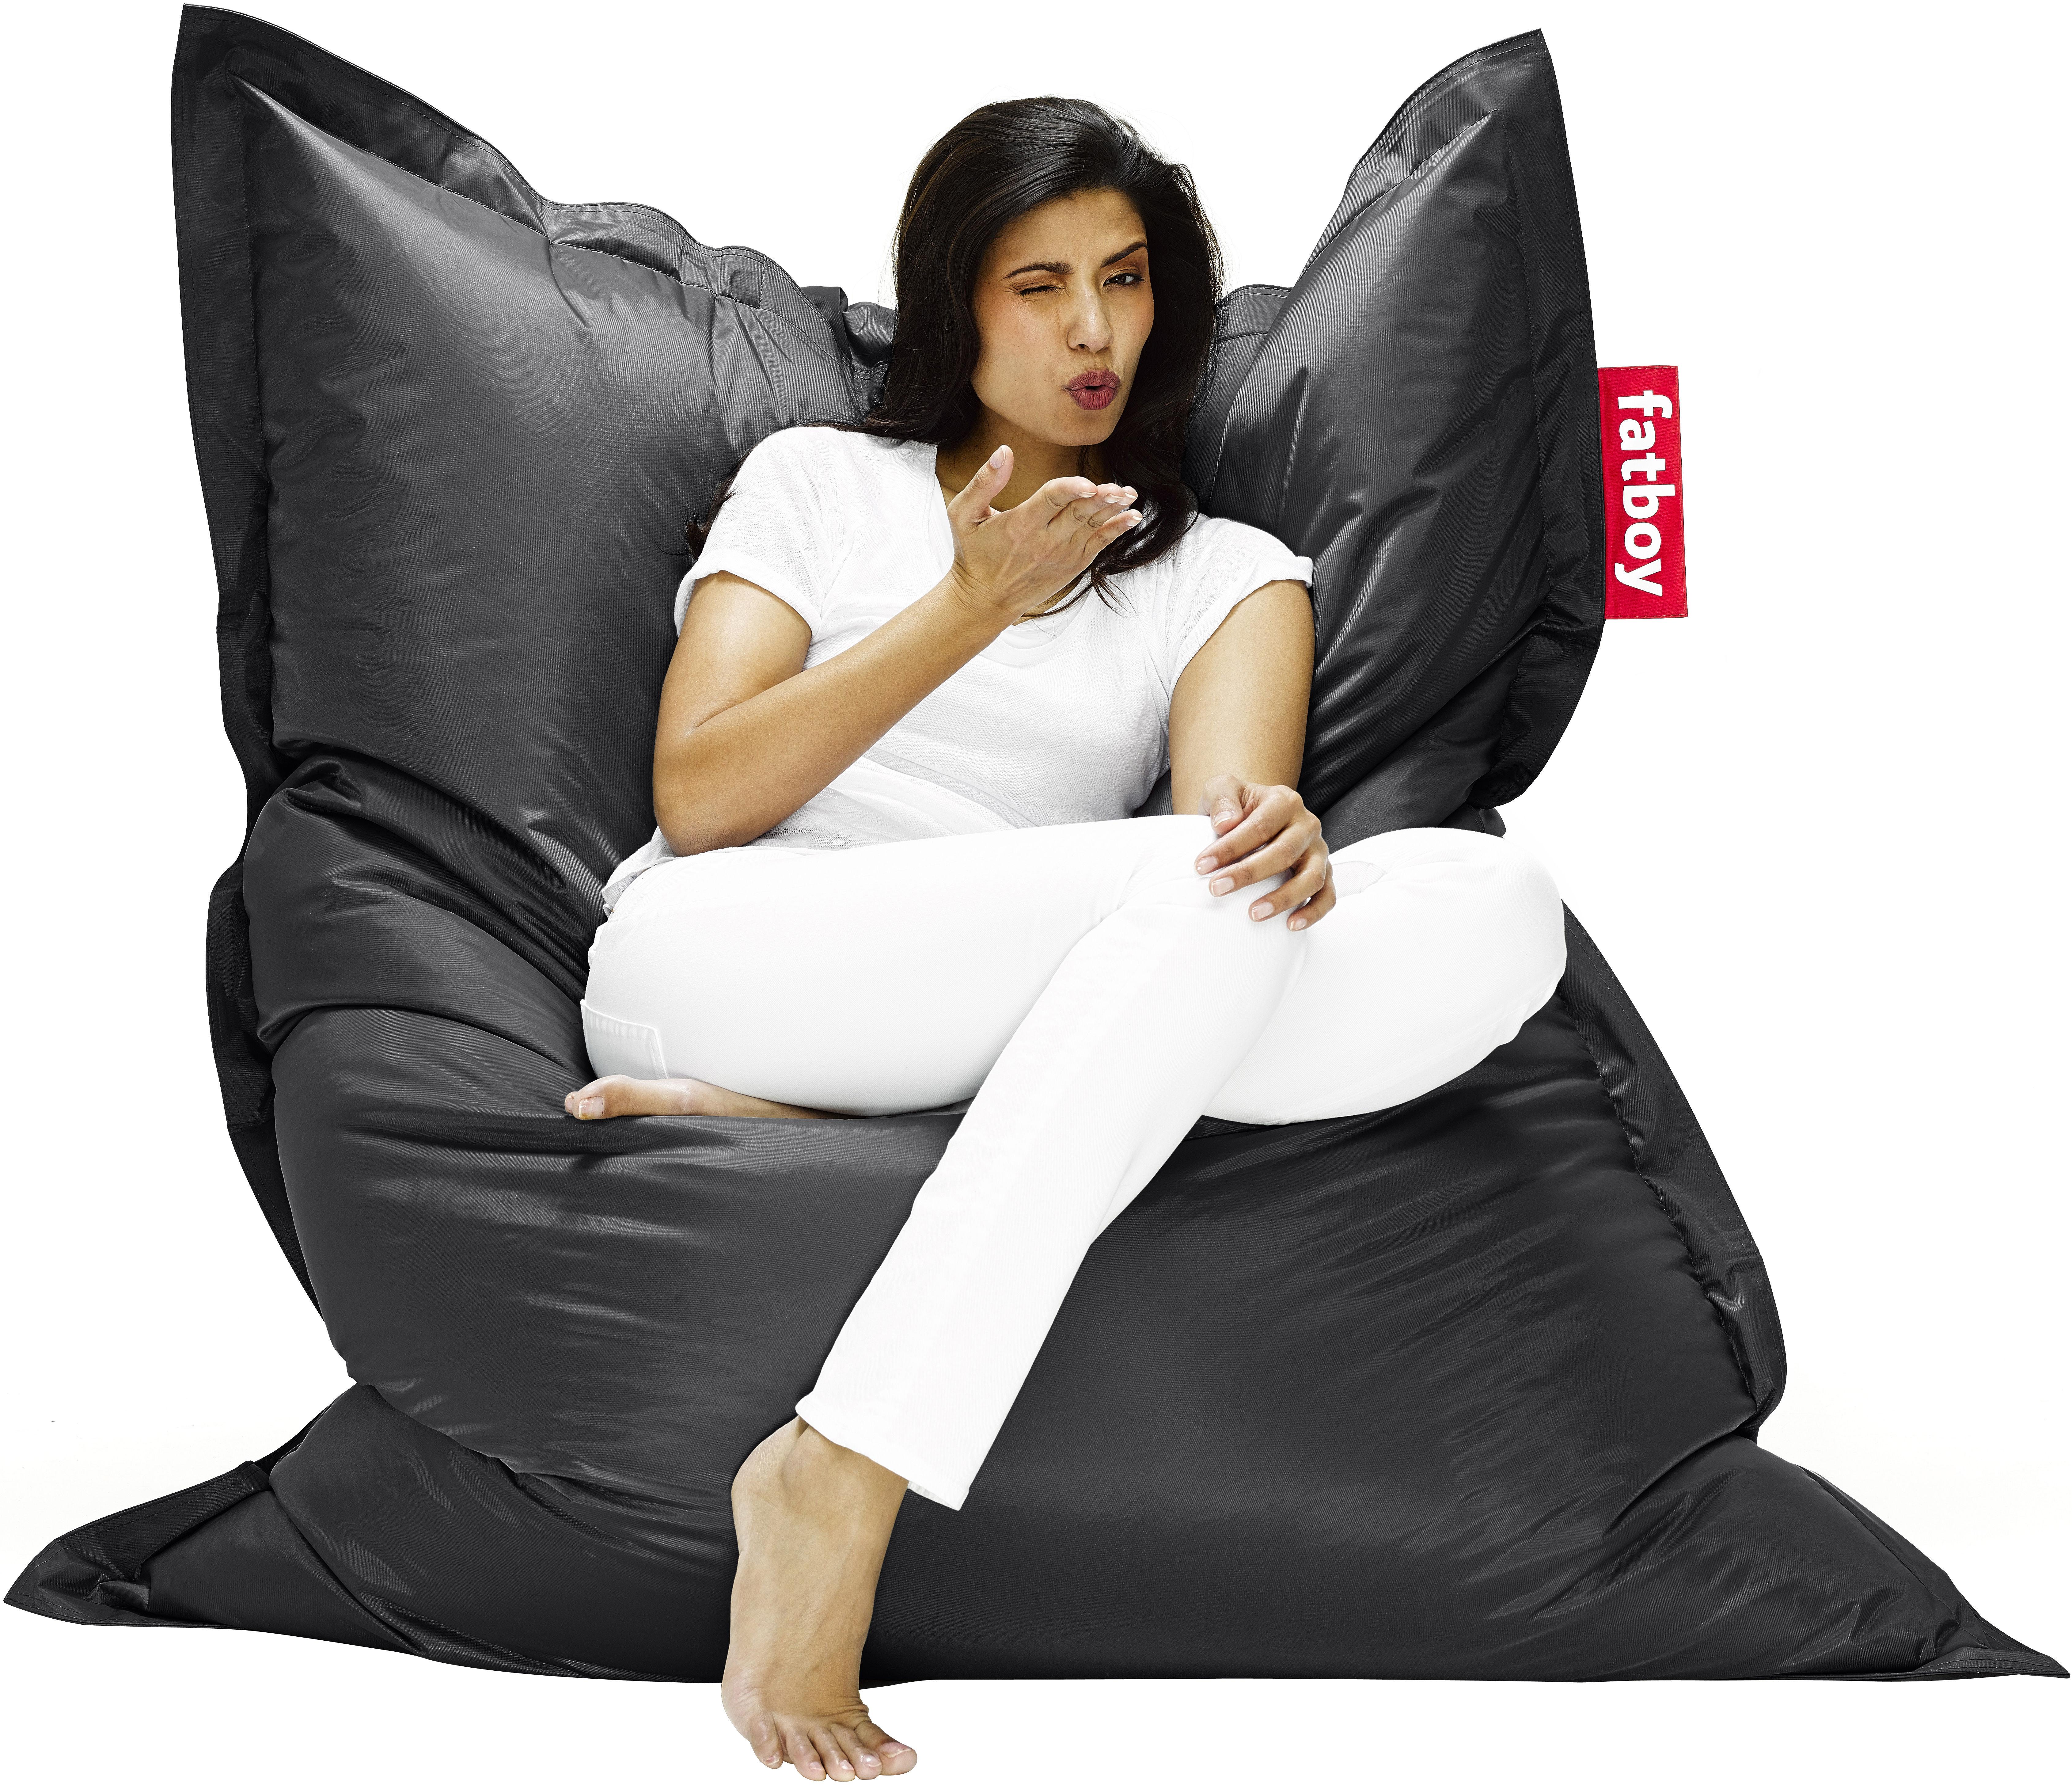 Furniture - Teen furniture - The Original Pouf by Fatboy - Black - Nylon, Polystyren balls